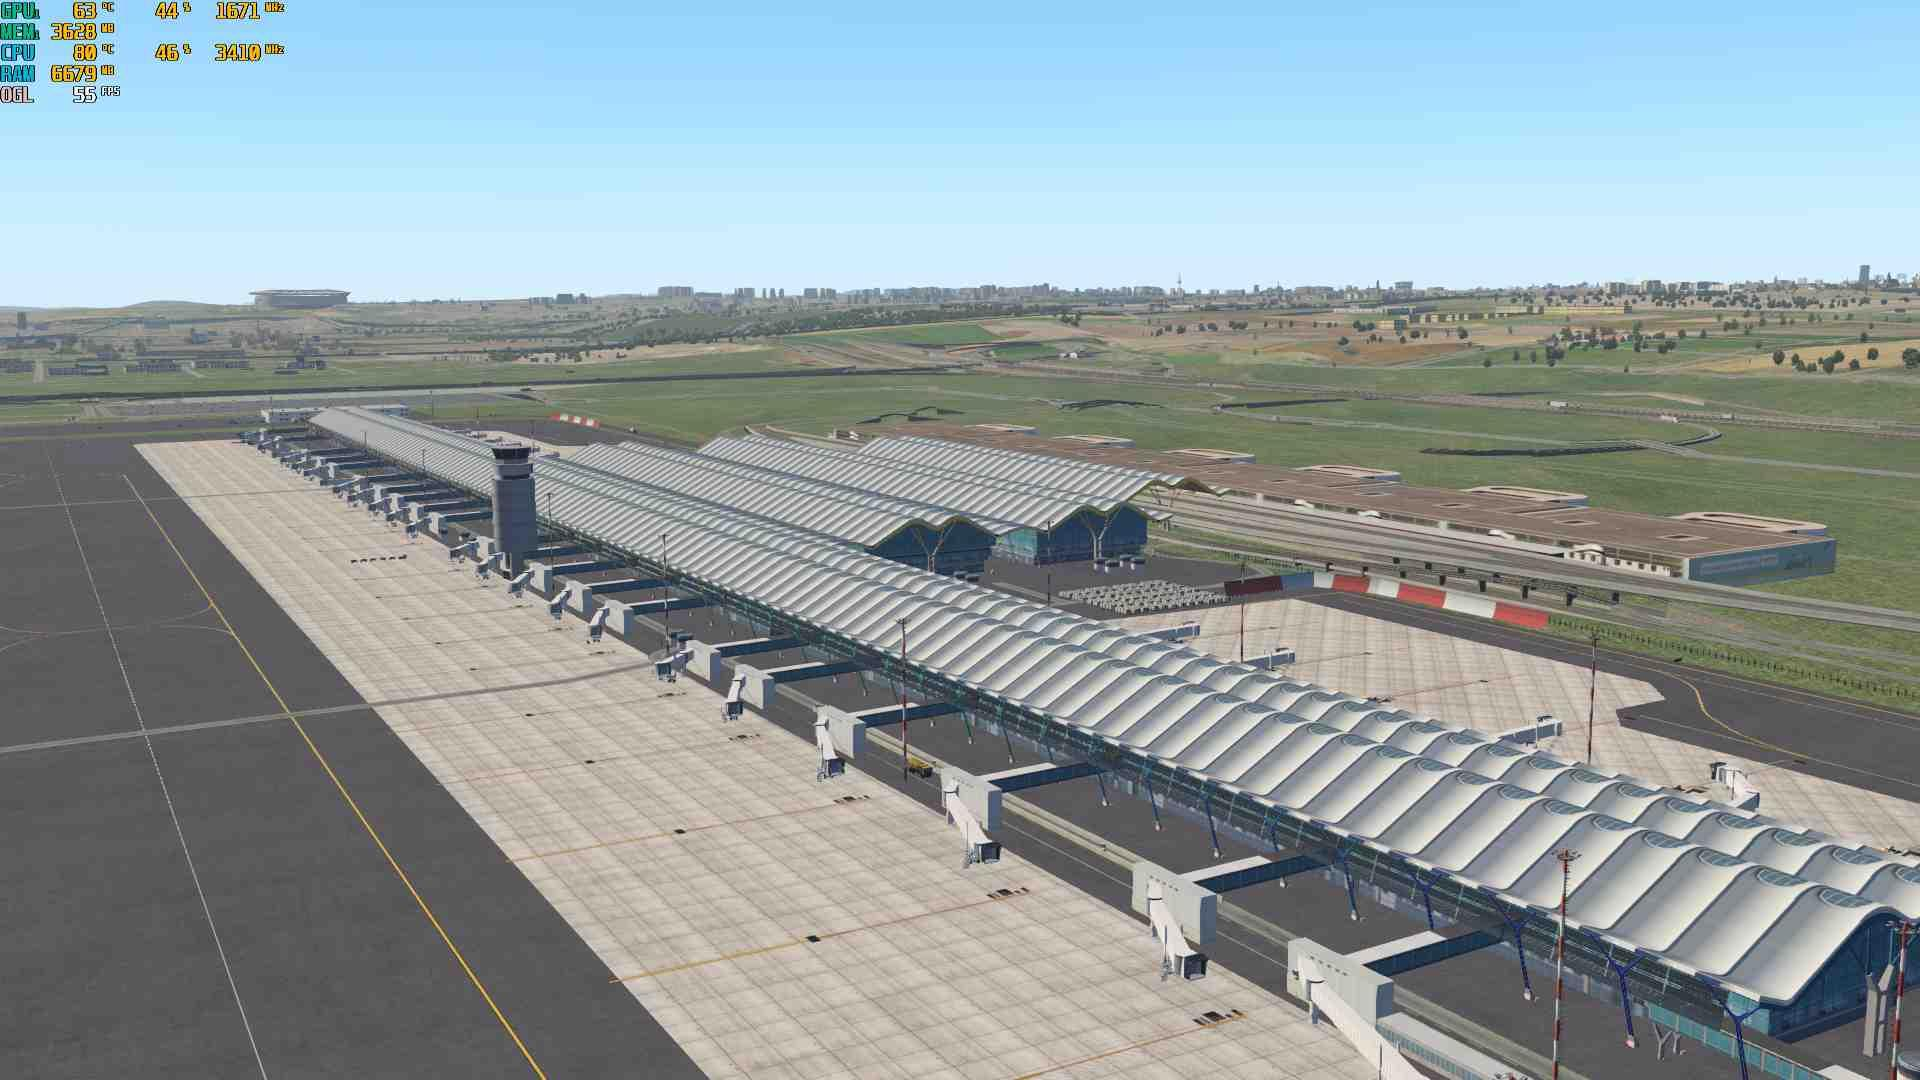 LEMD Adolfo Suárez Madrid-Barajas - Scenery Packages (v11,v